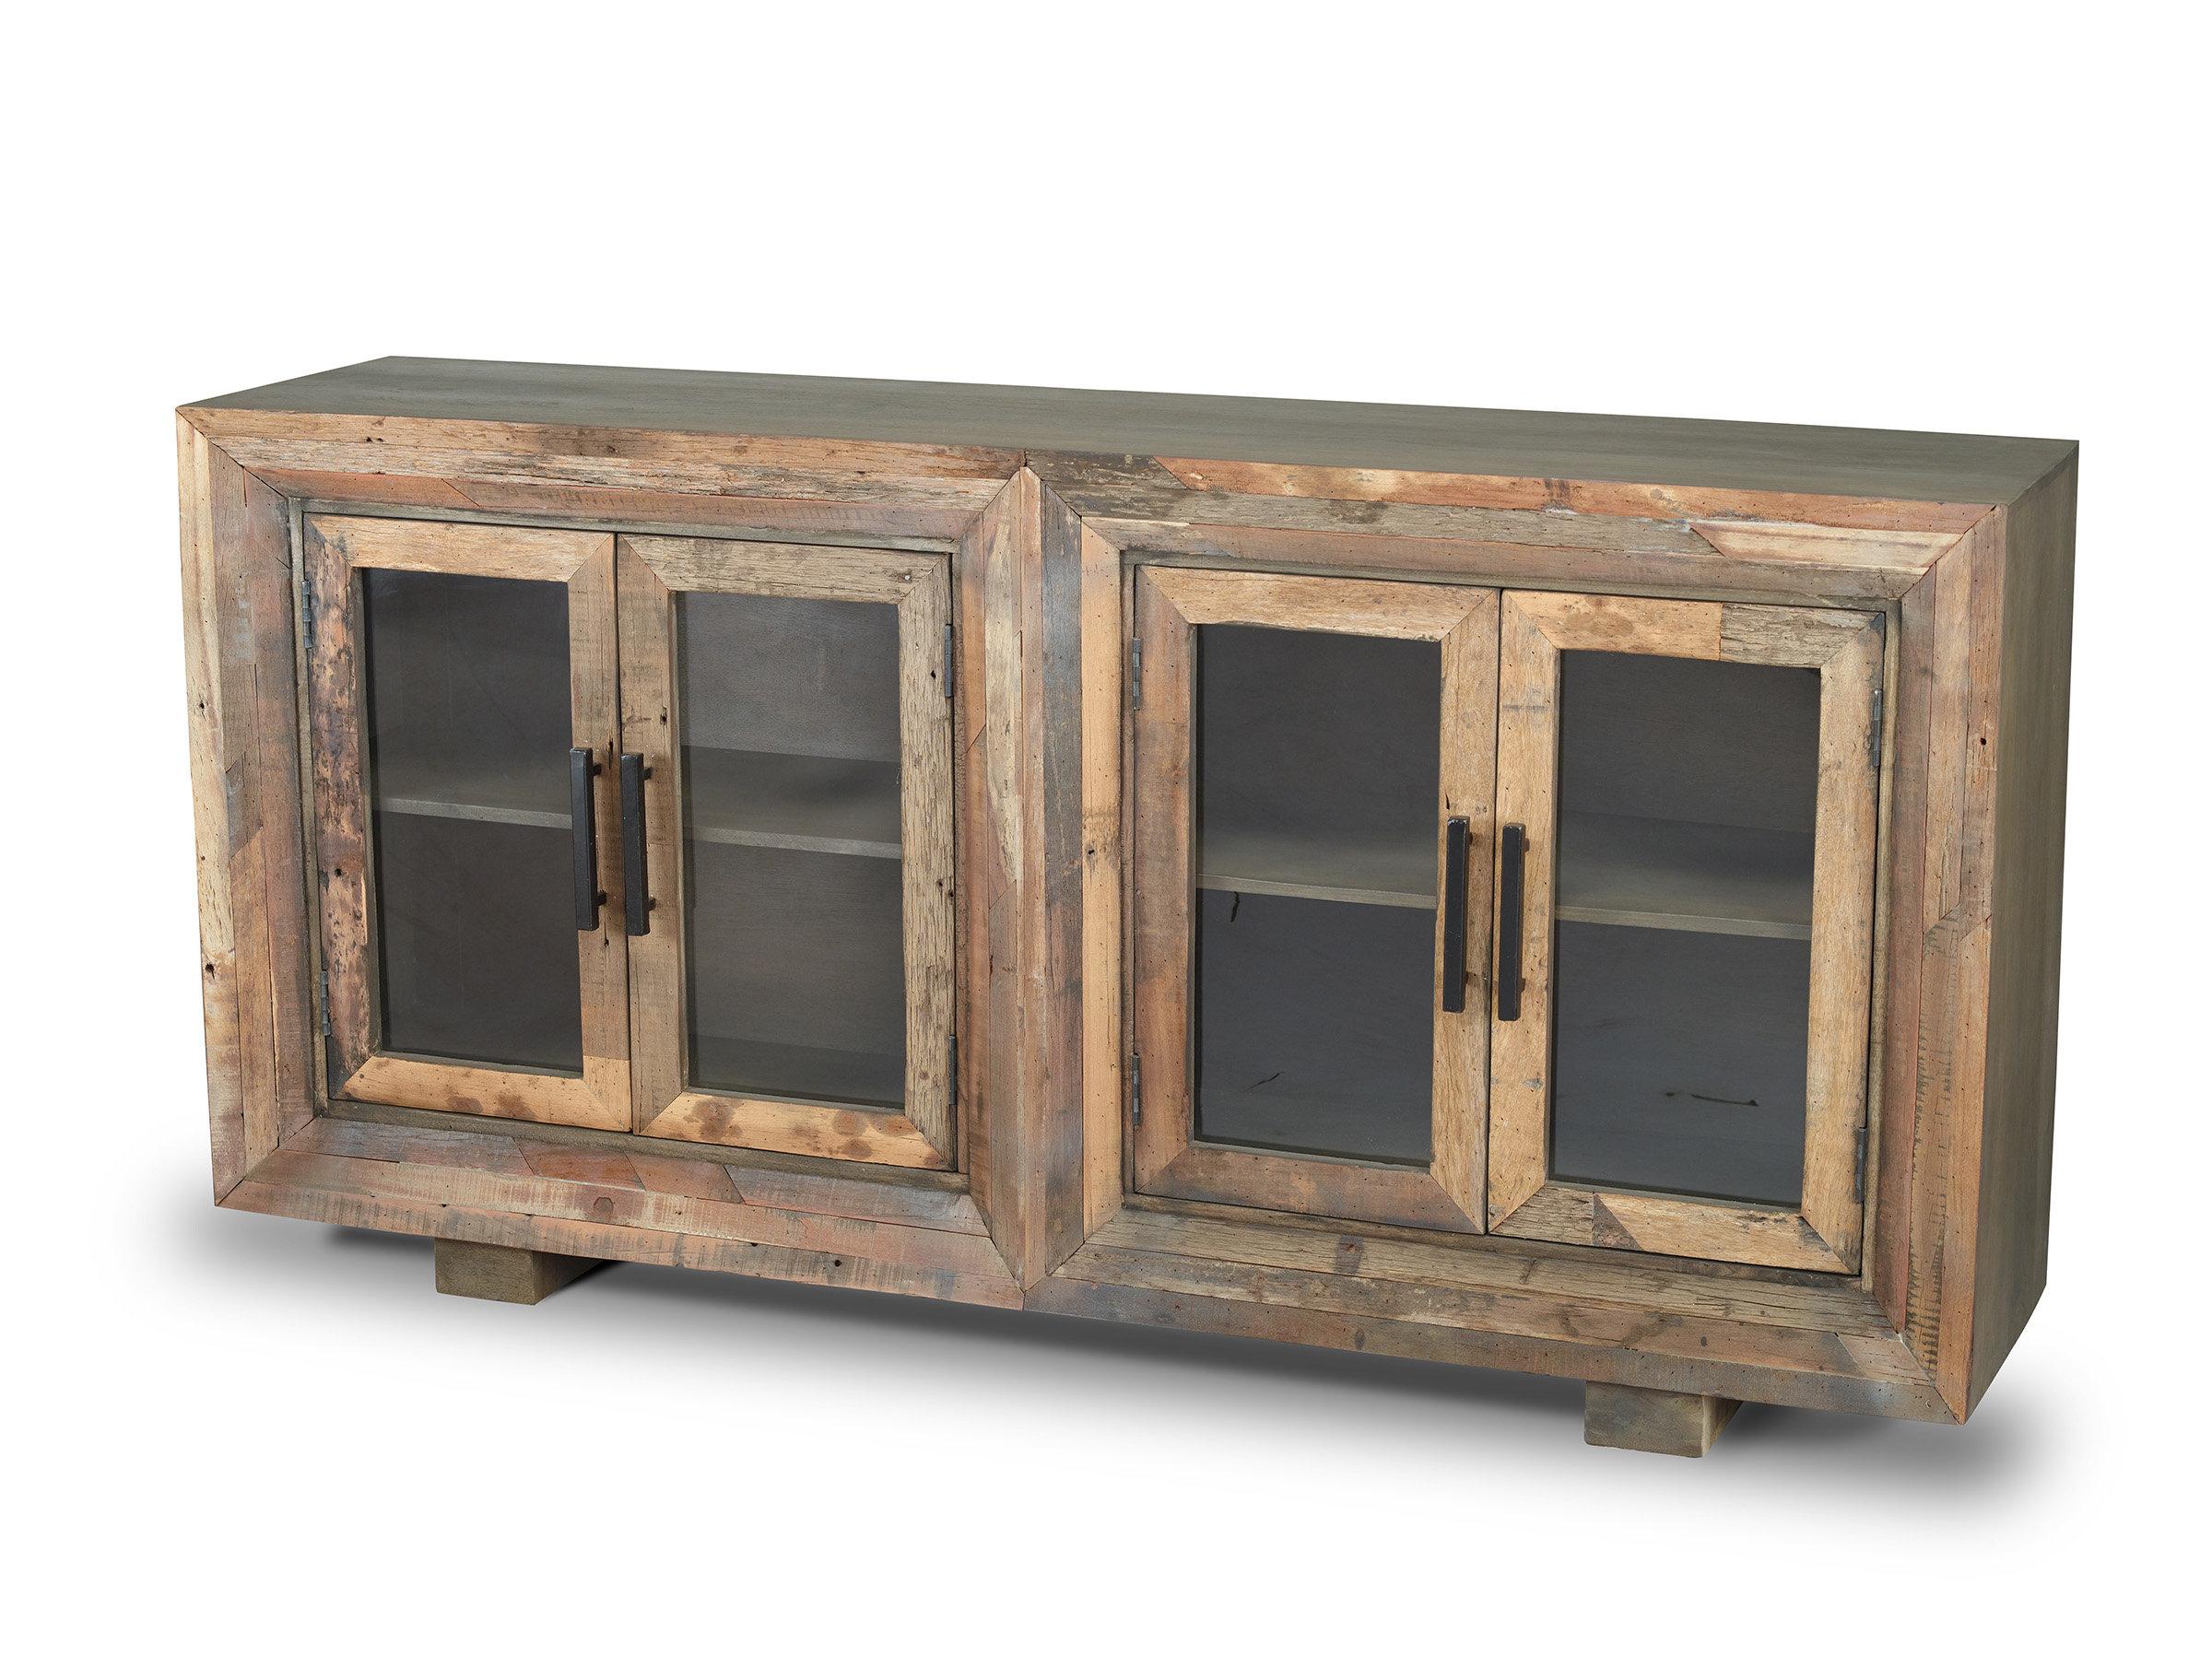 Stender 4 Door Sideboard Within Recent Stennis Sideboards (View 13 of 20)